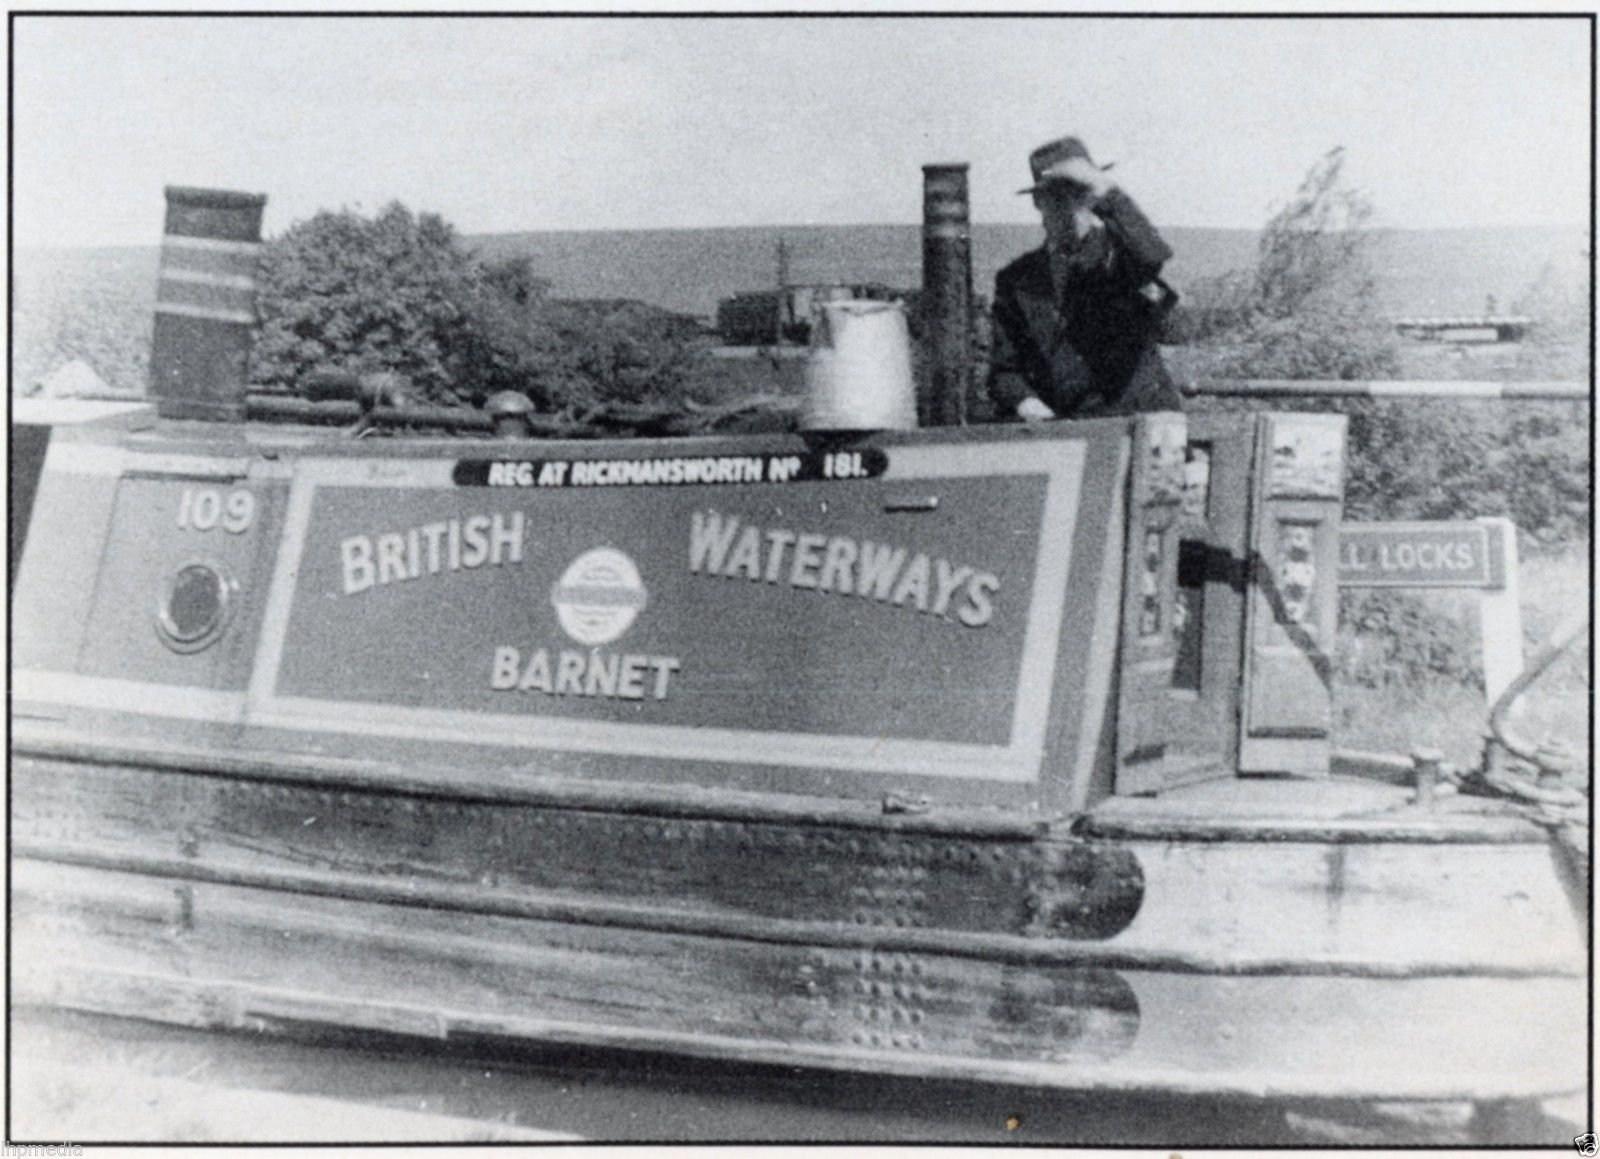 Wilf Townsend on Barnet